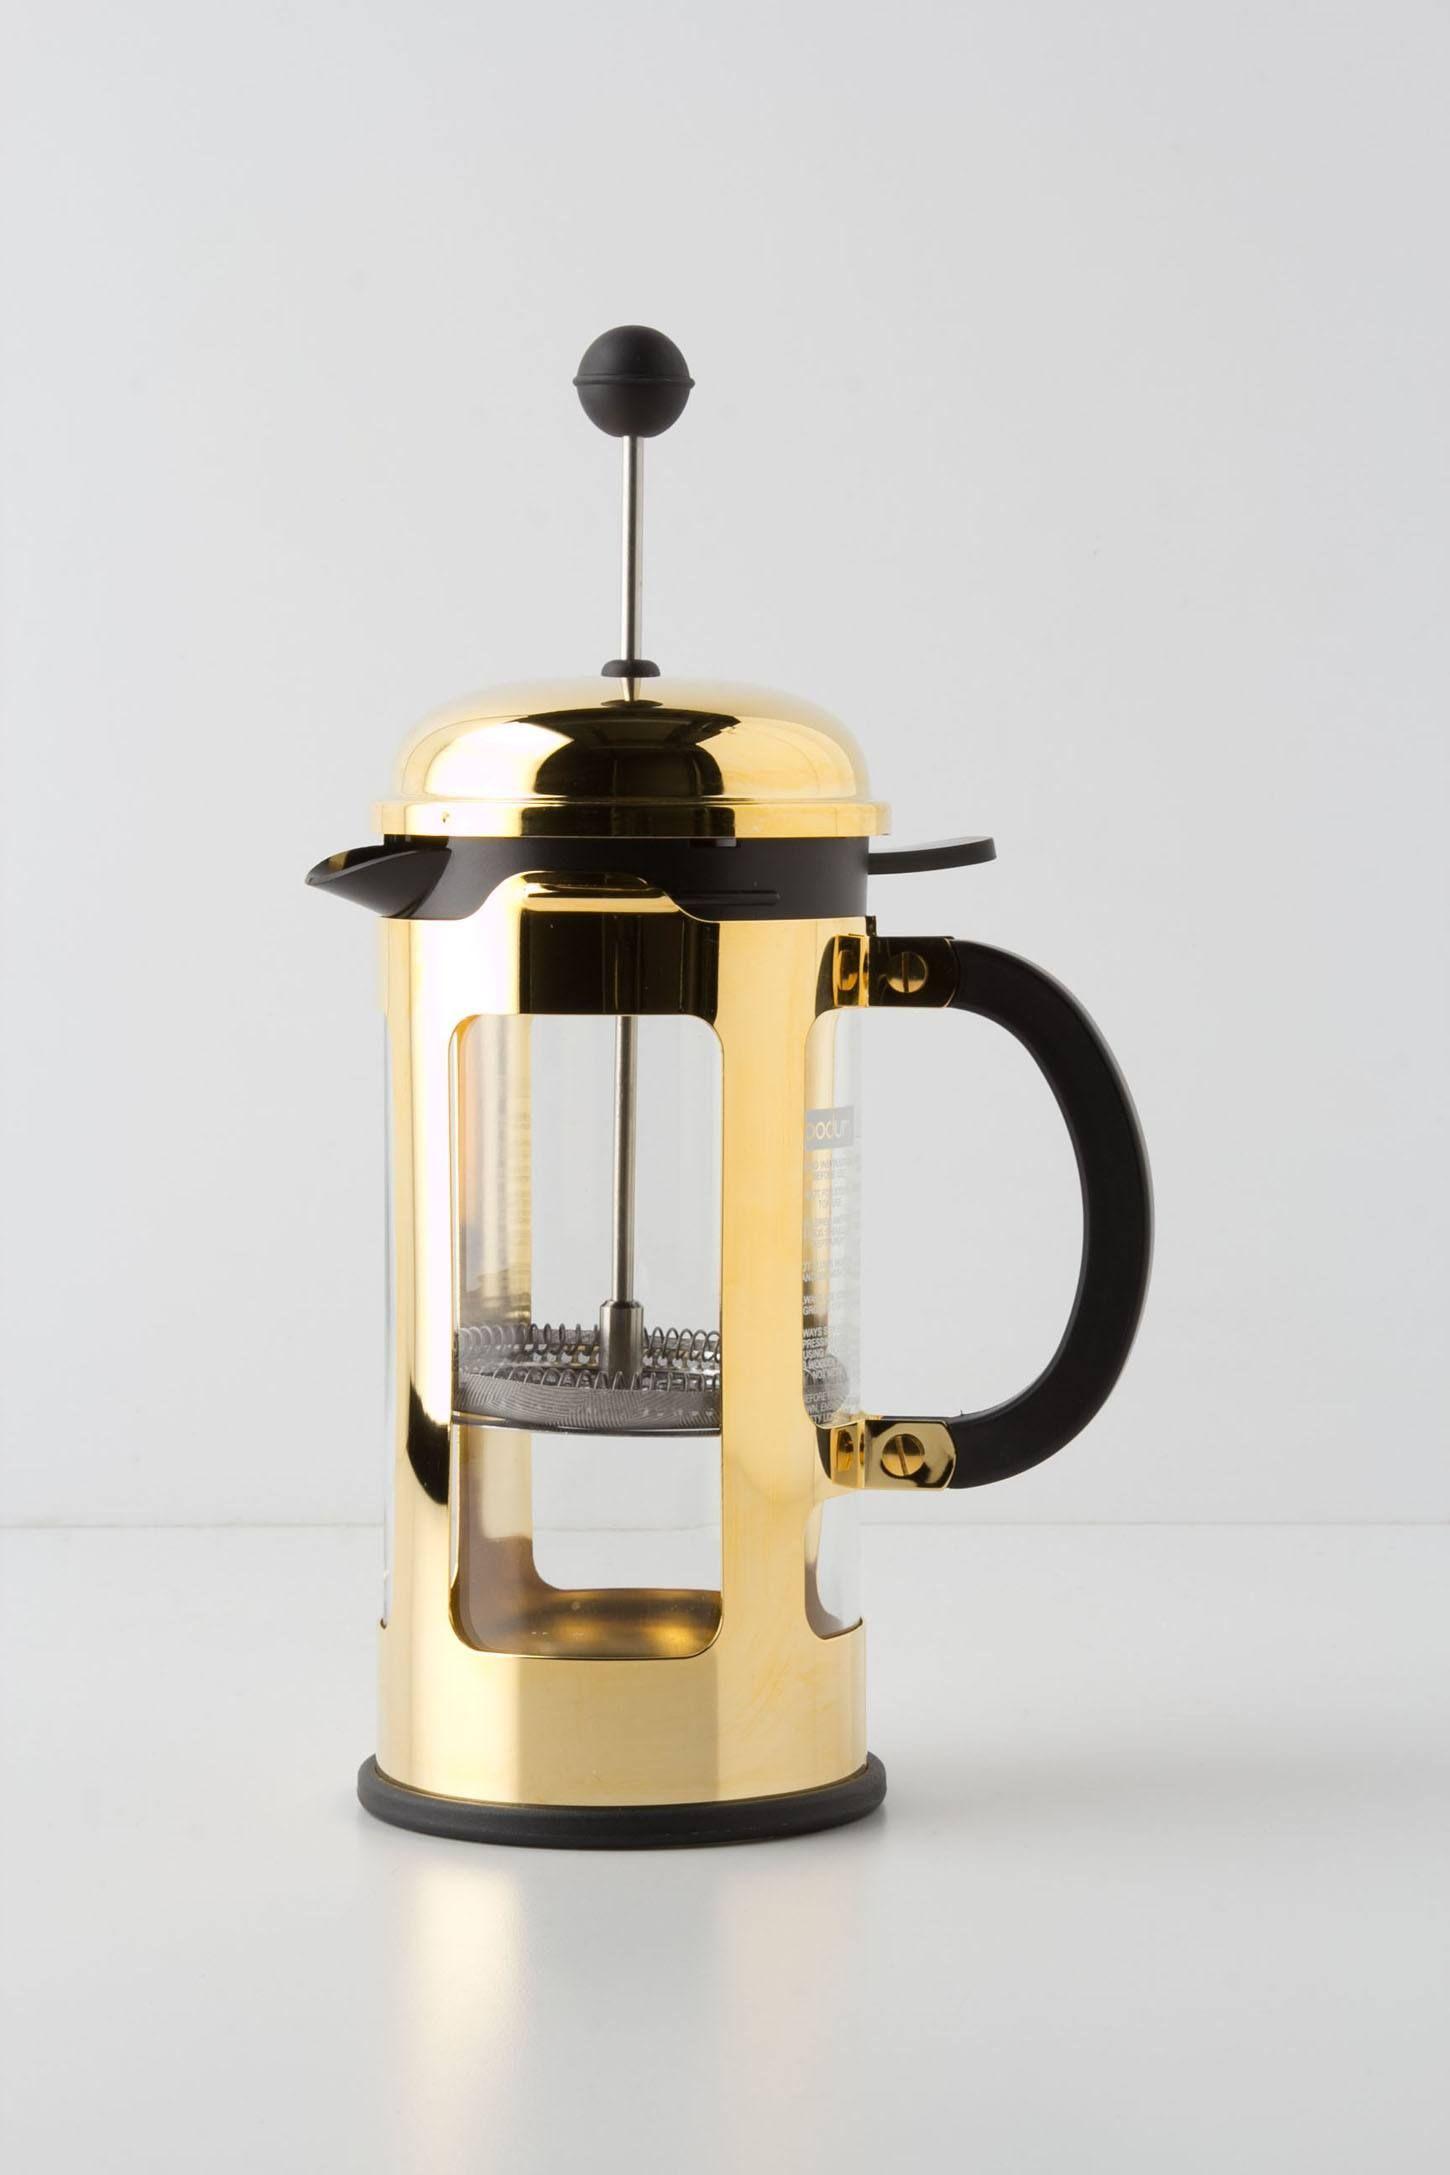 bodum chambord french press coffee cocinas cafetera utensilios. Black Bedroom Furniture Sets. Home Design Ideas